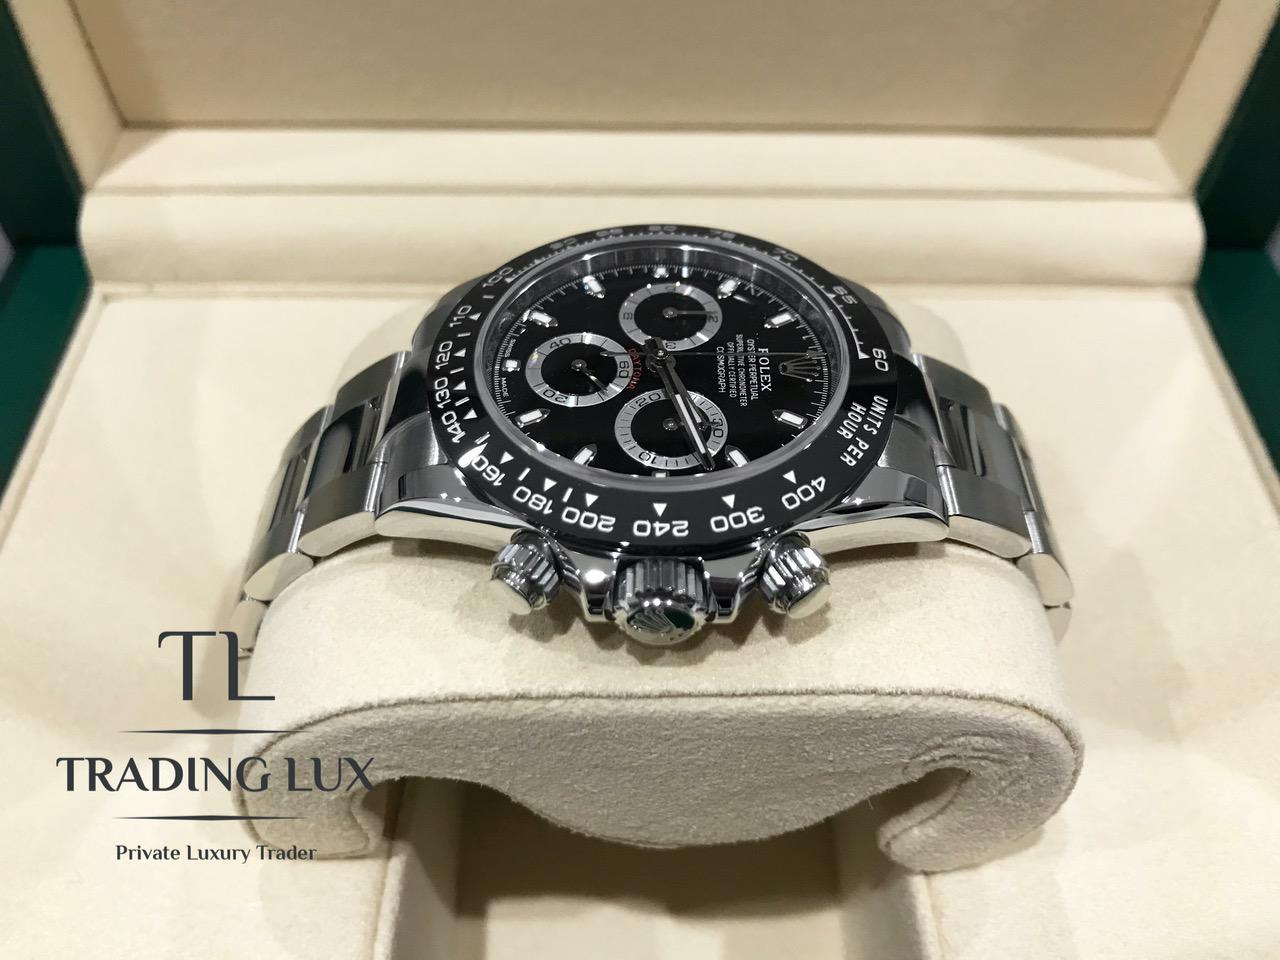 Rolex-Daytona-116500LN-Black-9